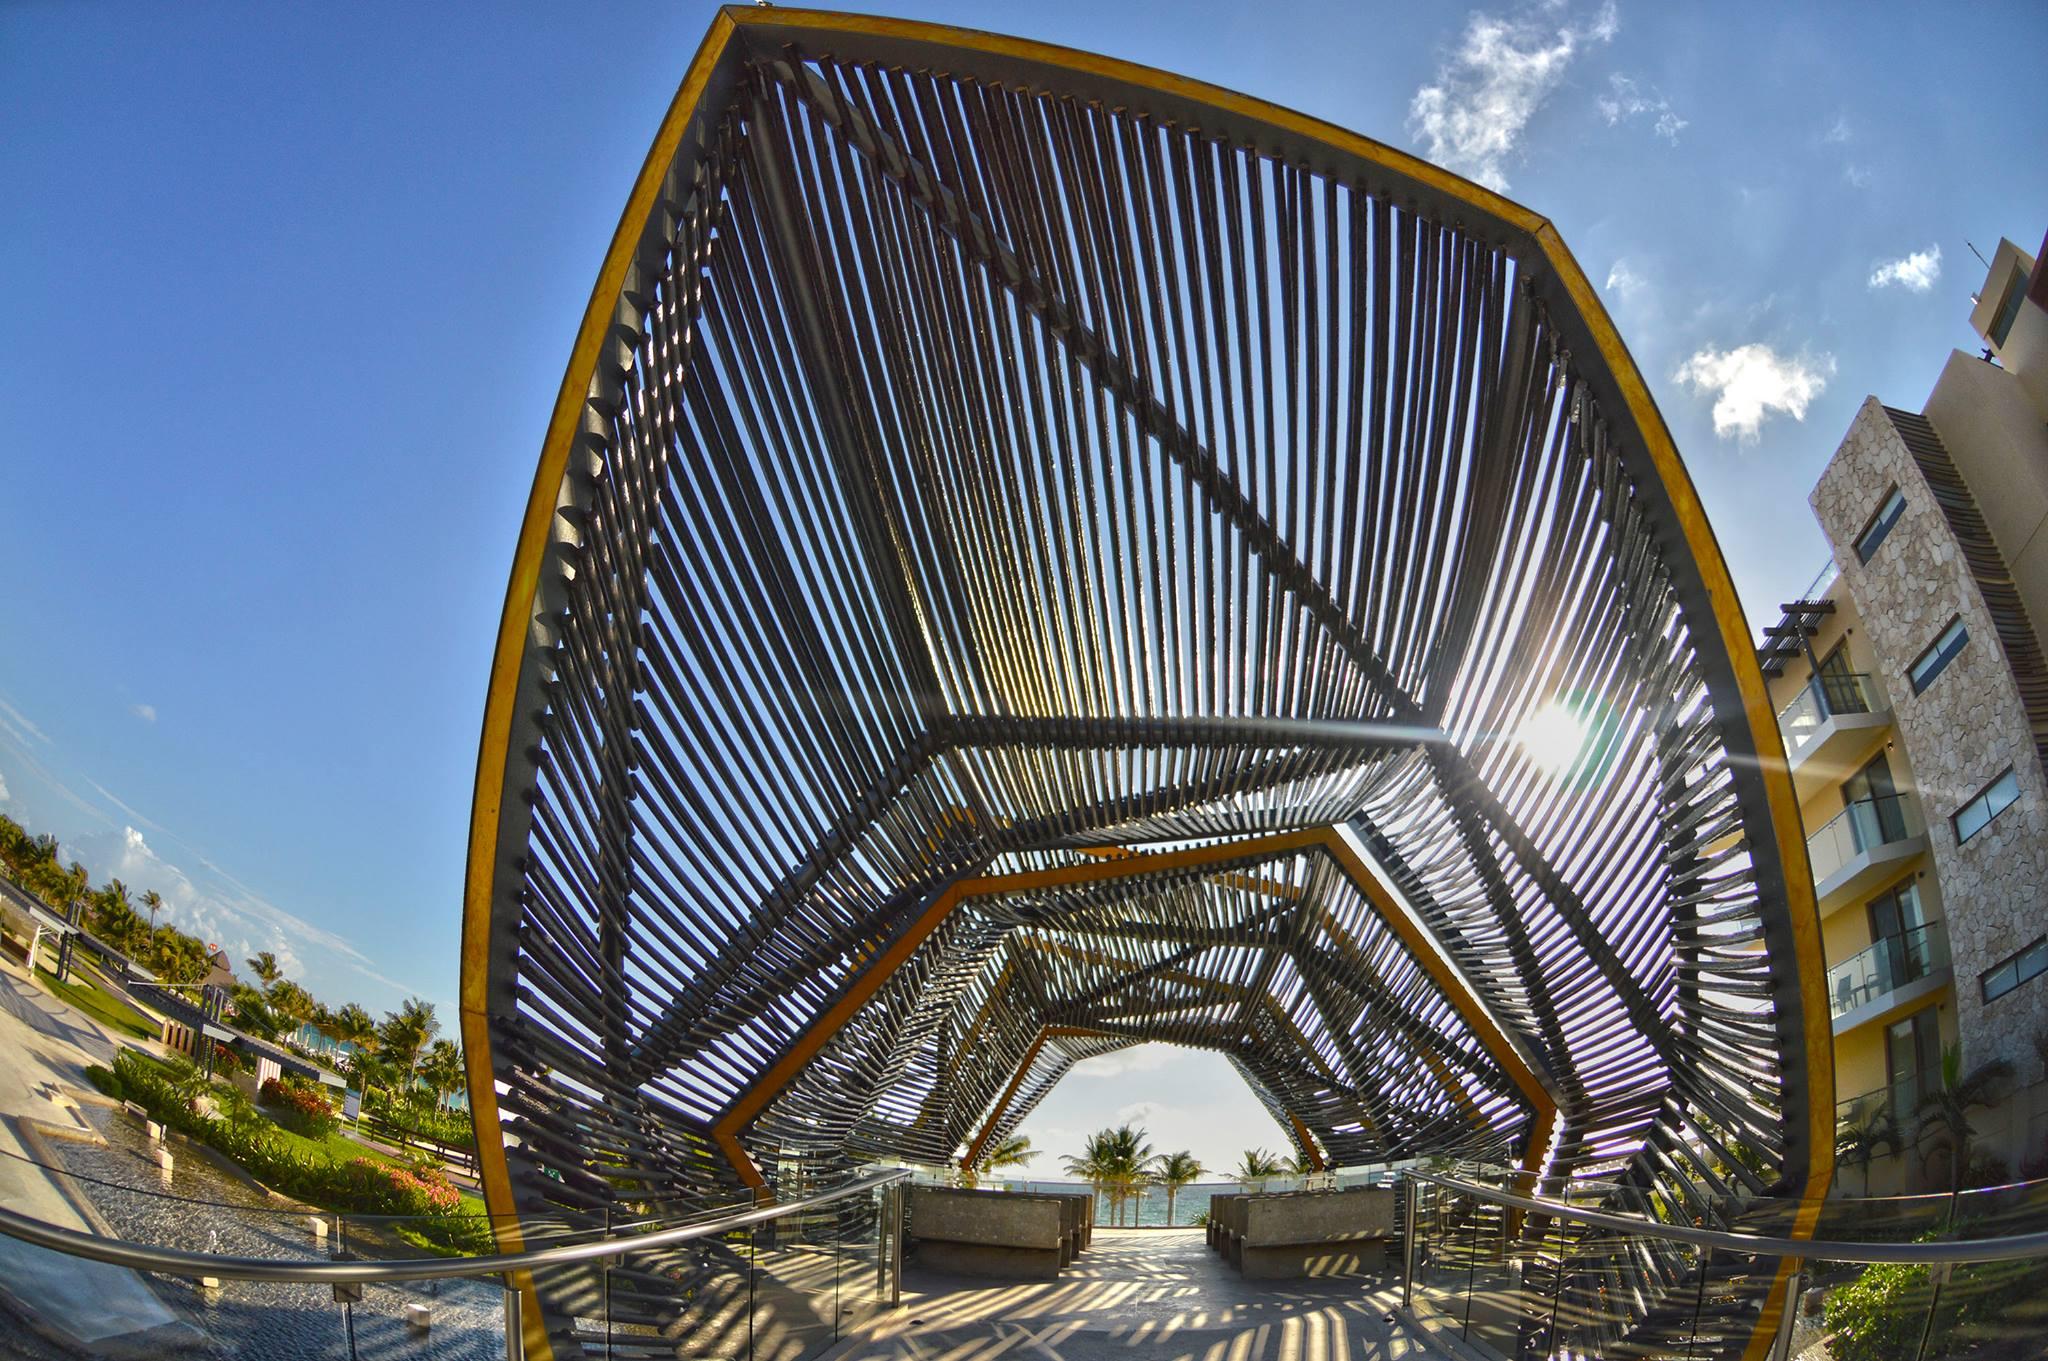 Royalton Riviera Cancun8.jpg